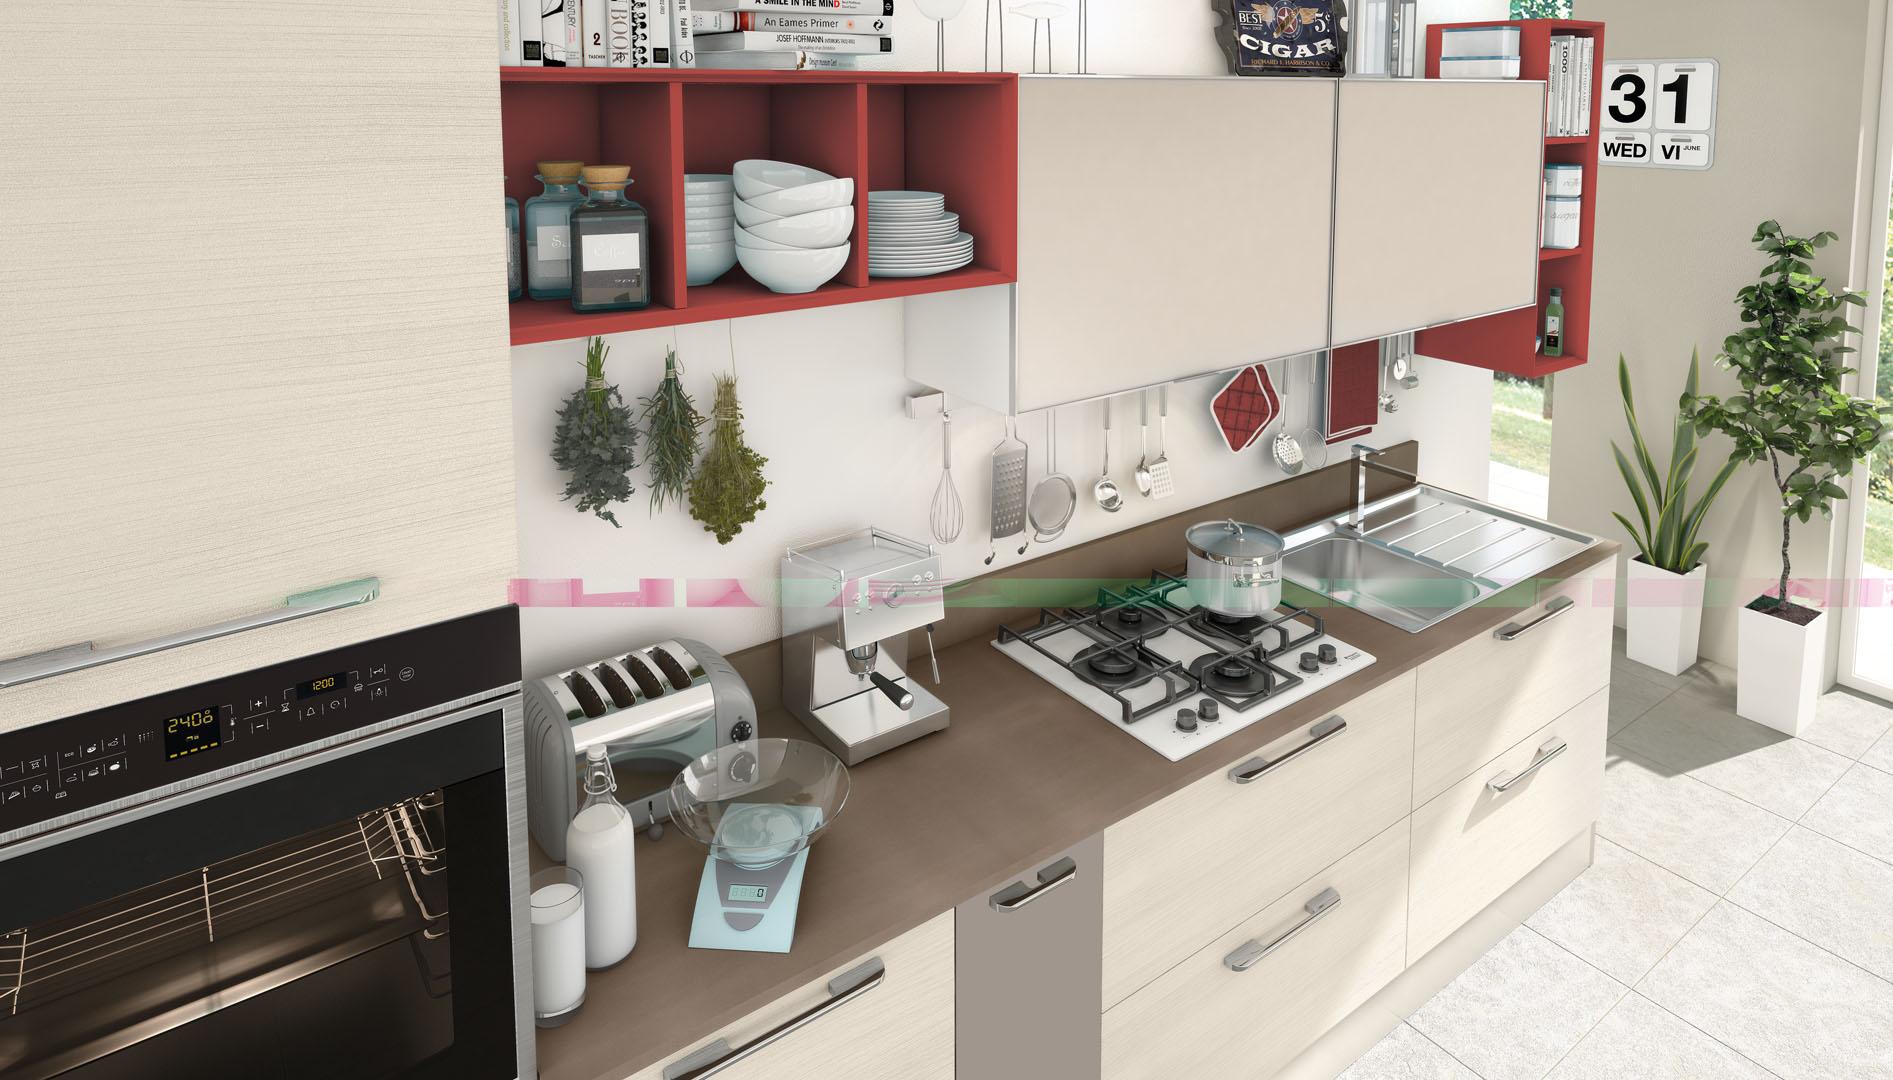 NOEMI Lube cucine Armonias (9)